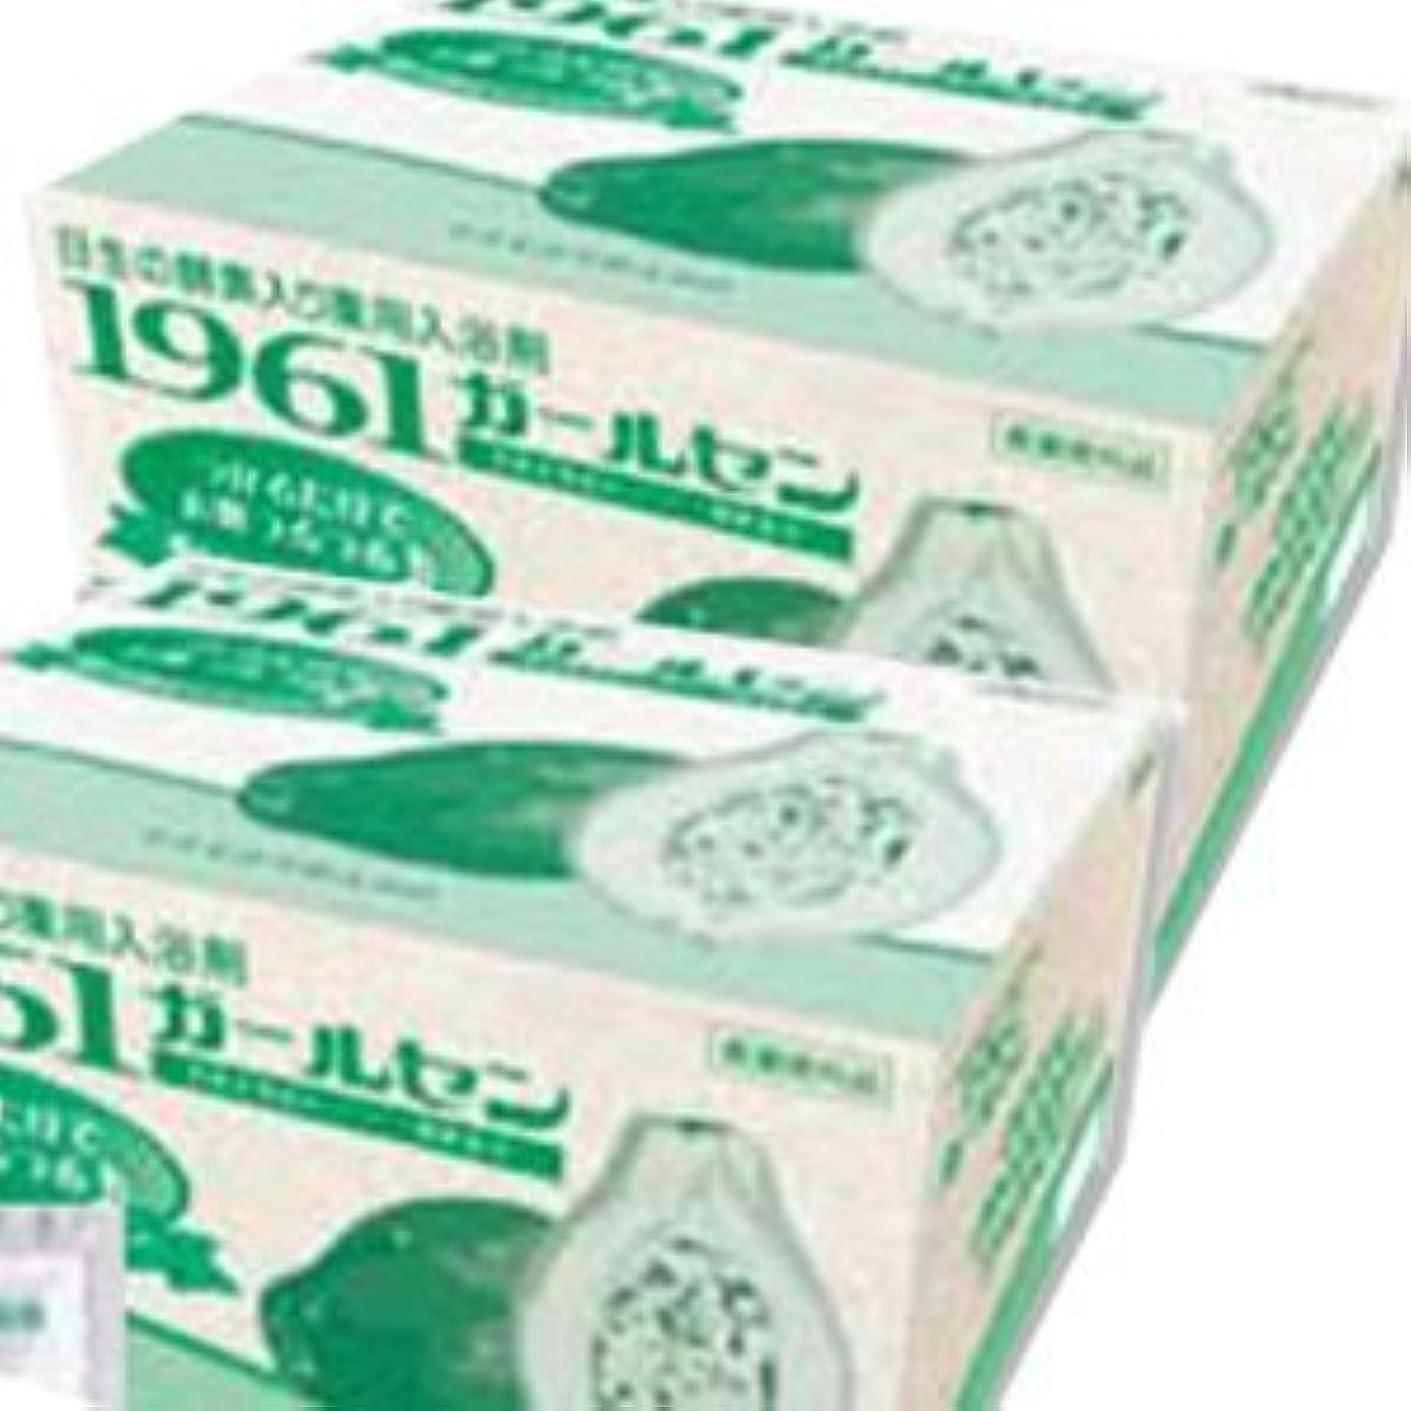 禁輸広げる仮装日本生化学 薬用入浴剤 1961ガールセン (20g×60包)×2箱 (医薬部外品)